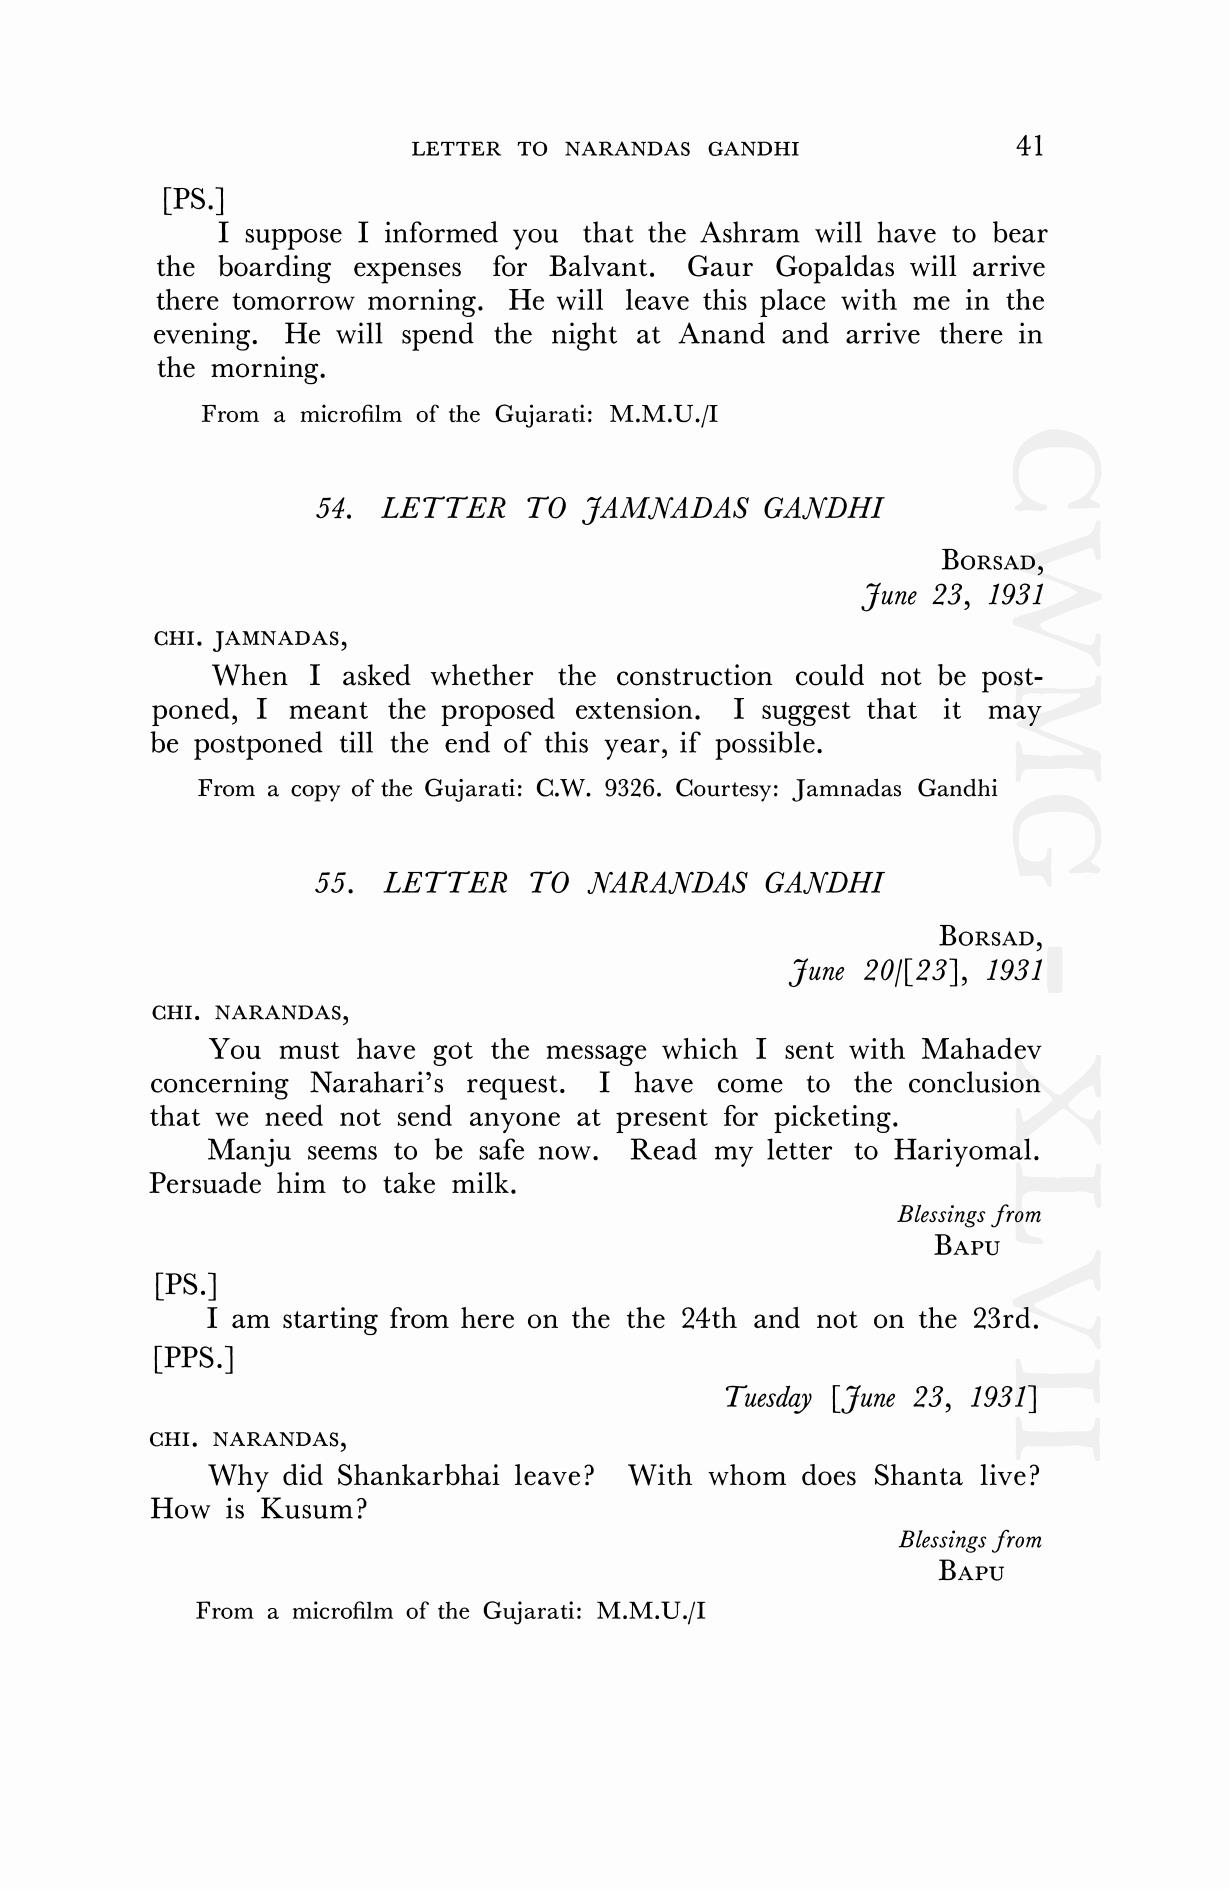 CWMG - Vol  47 - GandhiServe Foundation